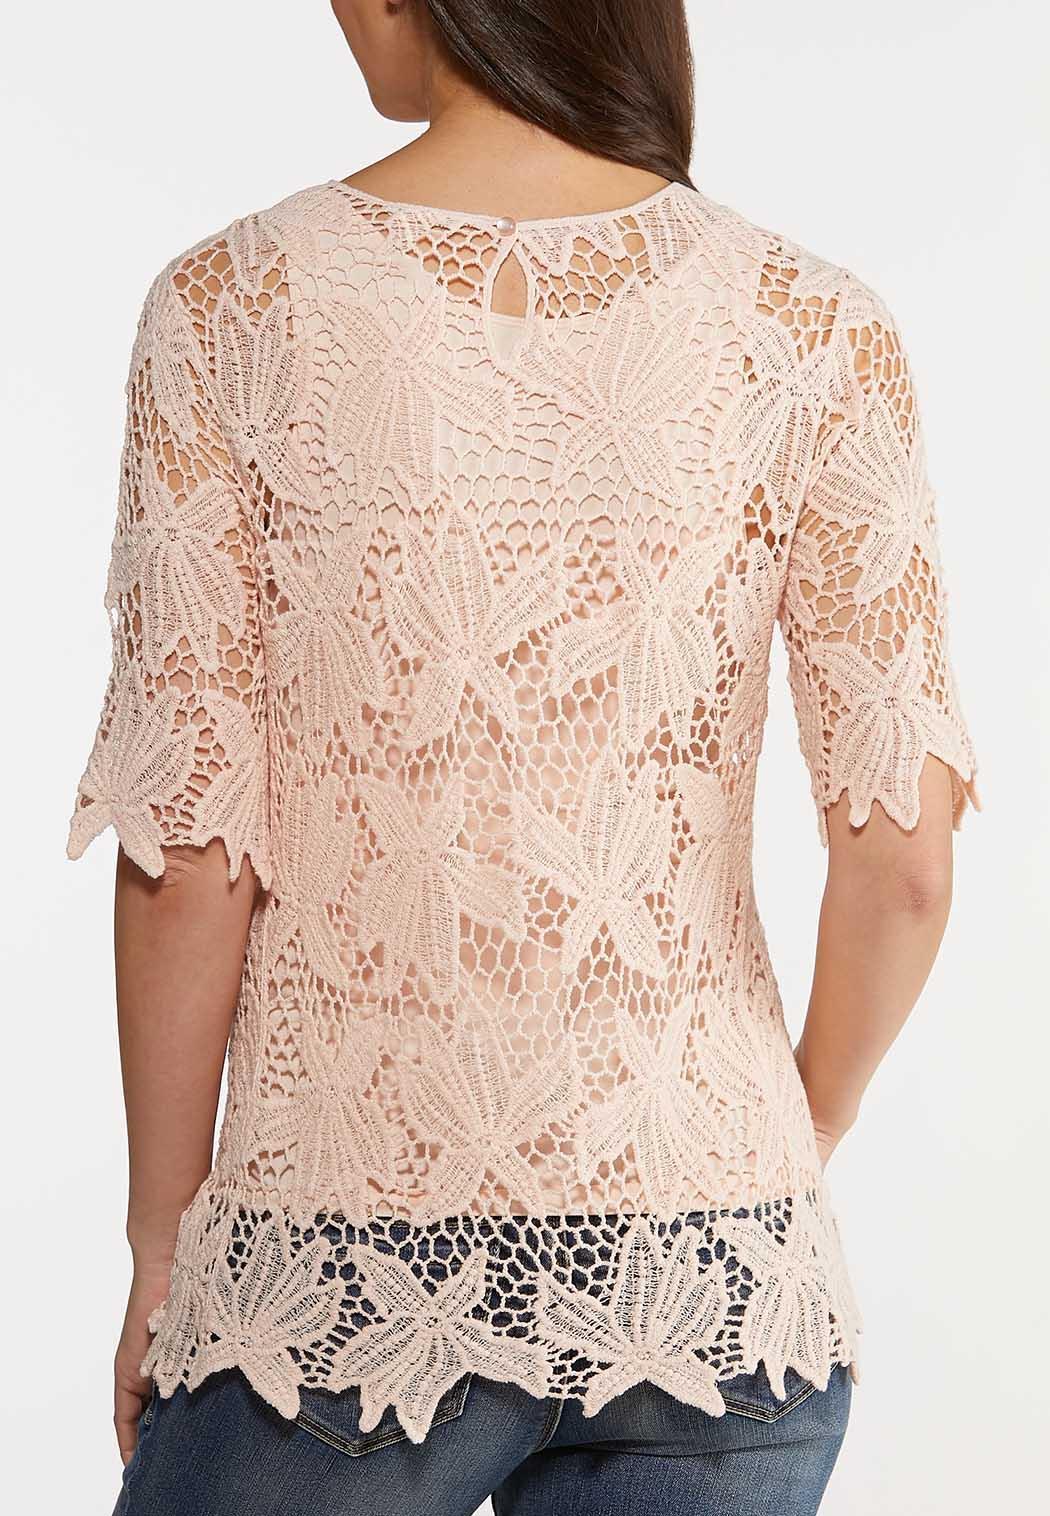 Pale Blush Crochet Top (Item #44188099)